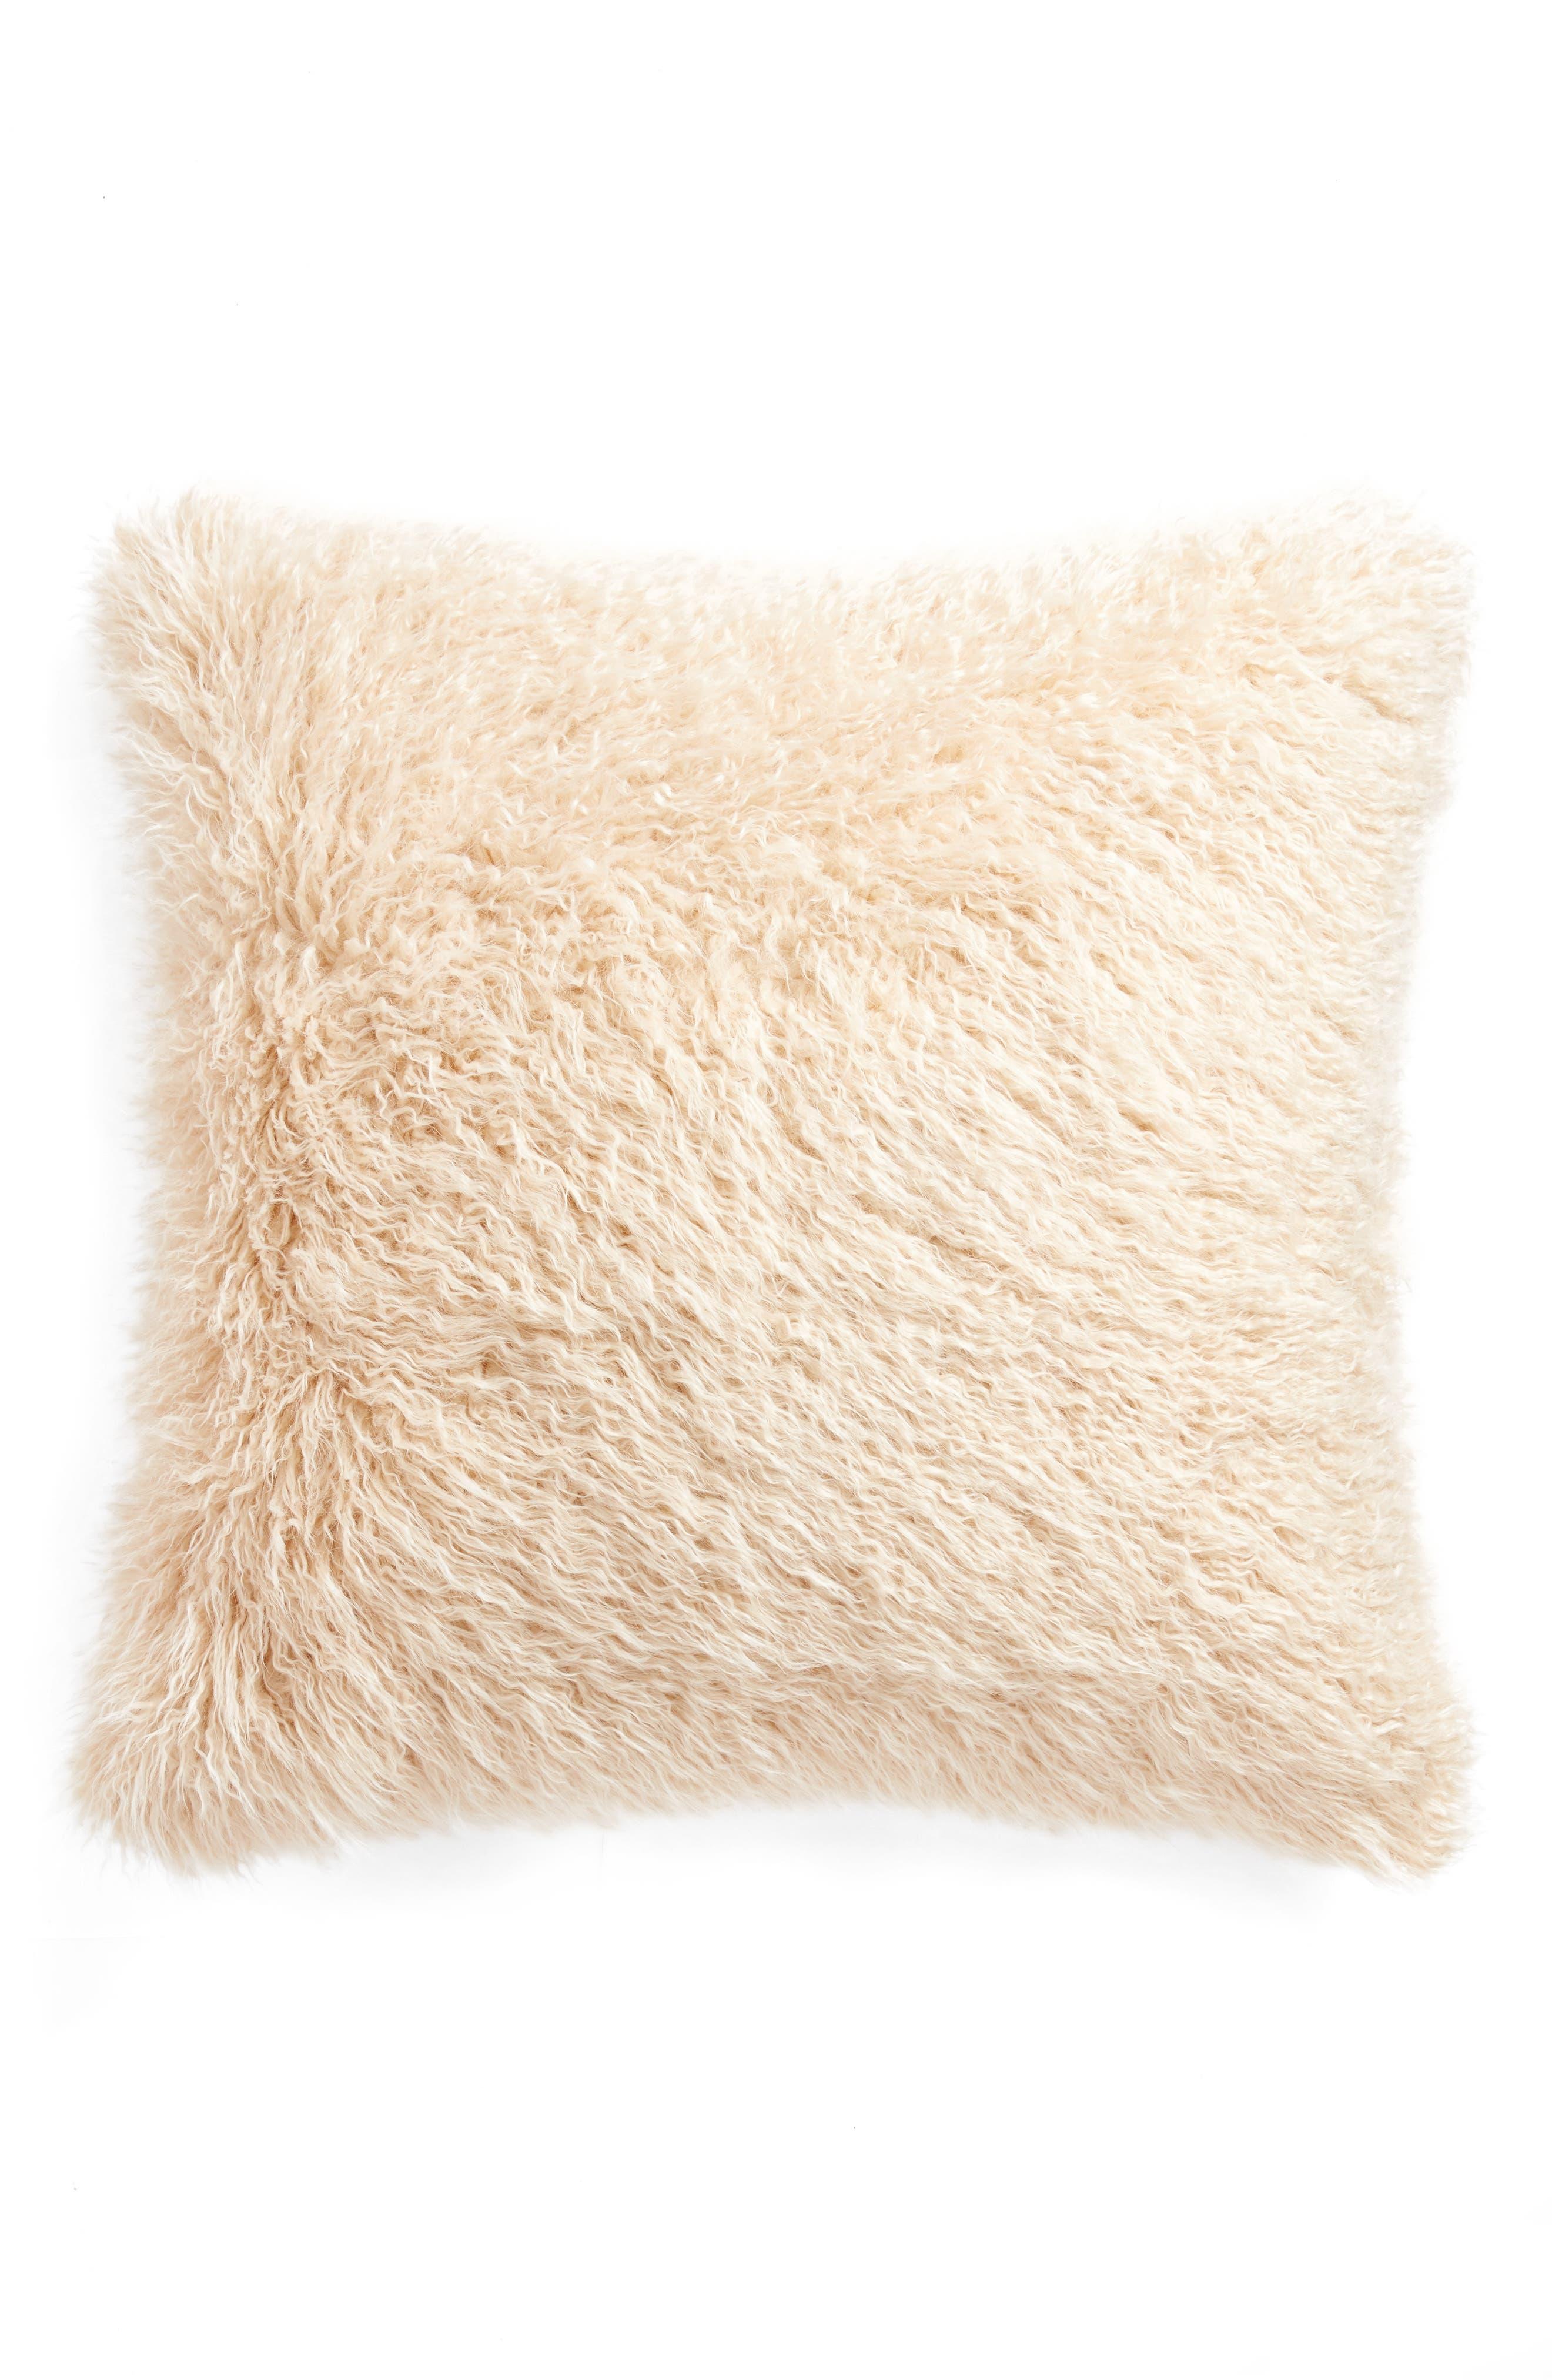 TREASURE & BOND Curly Faux Fur Pillow, Main, color, BEIGE BEACH